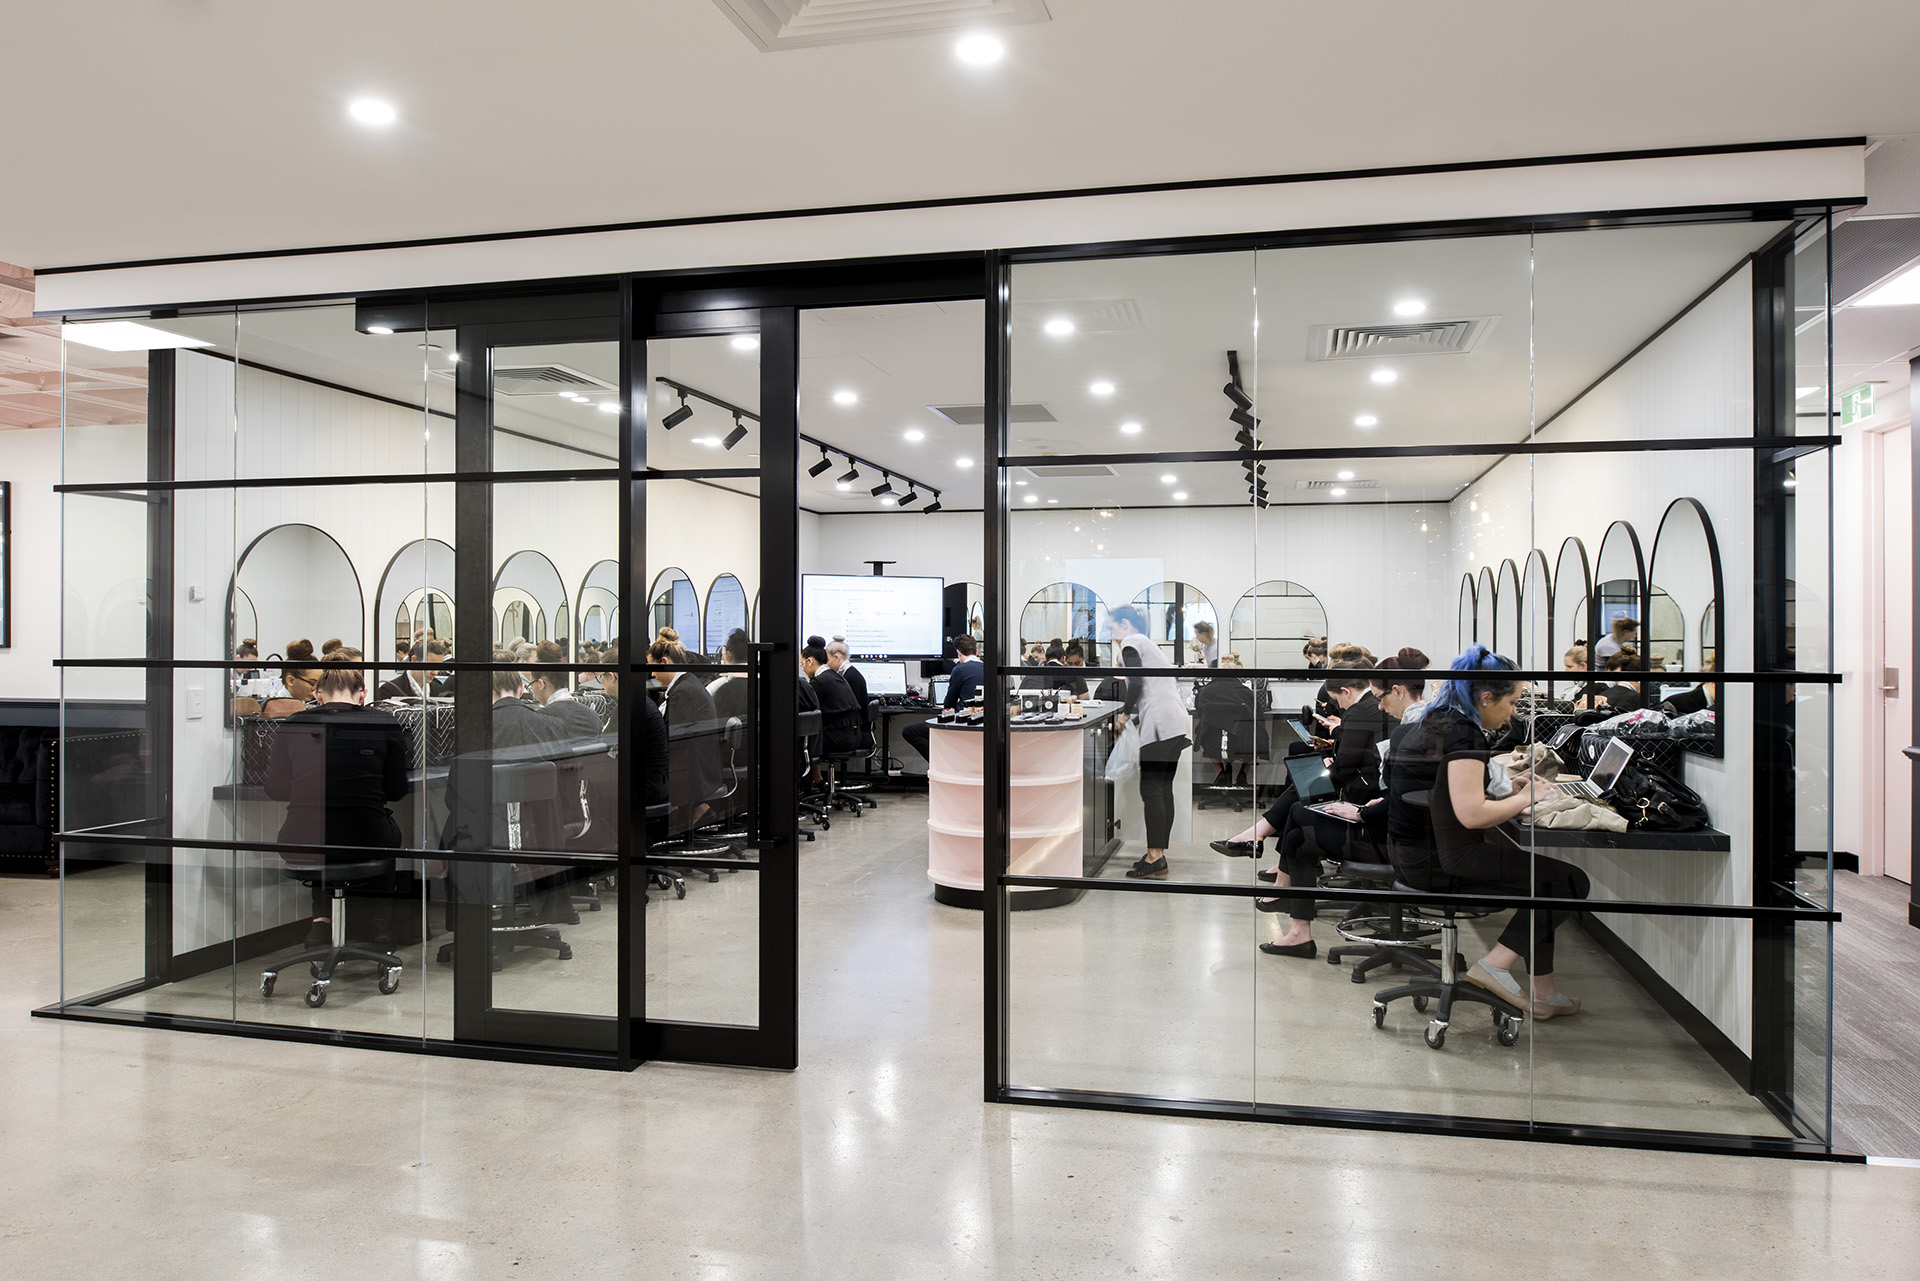 Archway-French Office Design Brisbane- Office 2.jpg